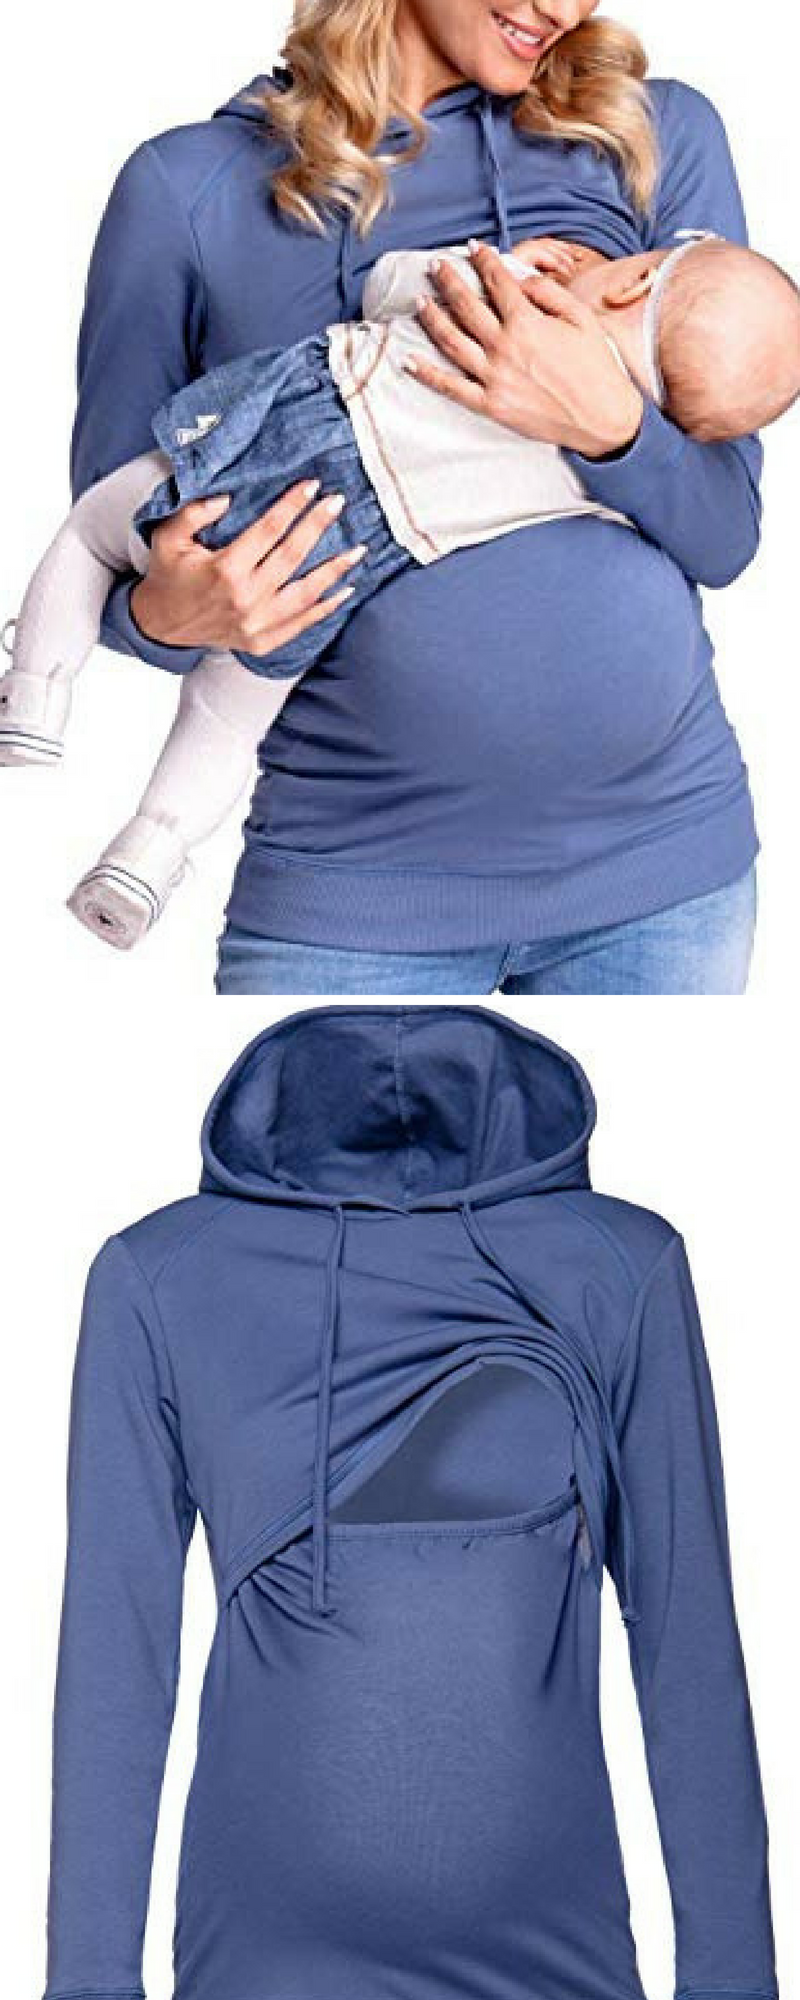 bf073d0a701 I'm in love with hoodies and I don't want to stop wearing them when I'm  pregnant and breastfeeding. Women's Nursing Hoodie Breastfeeding Sweatshirt  Top ...